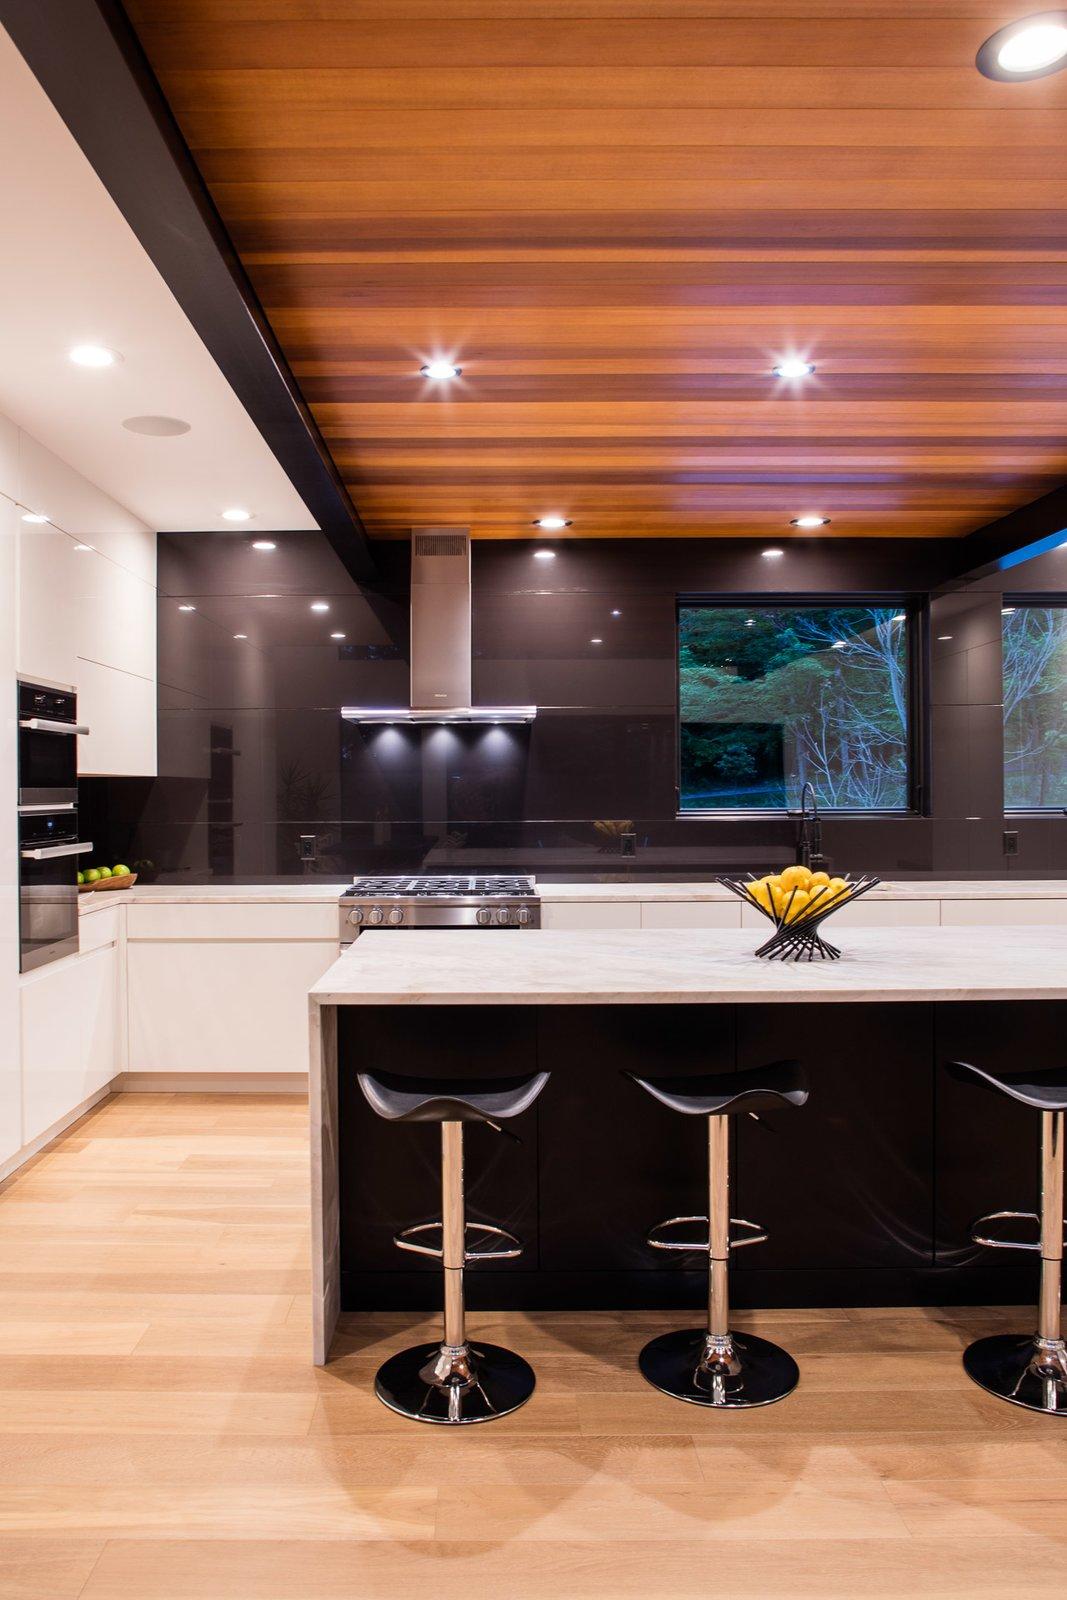 Kitchen, Quartzite, Wall Oven, Light Hardwood, Undermount, Range, White, and Refrigerator  Best Kitchen Quartzite Range Undermount Photos from Rogue River Residence